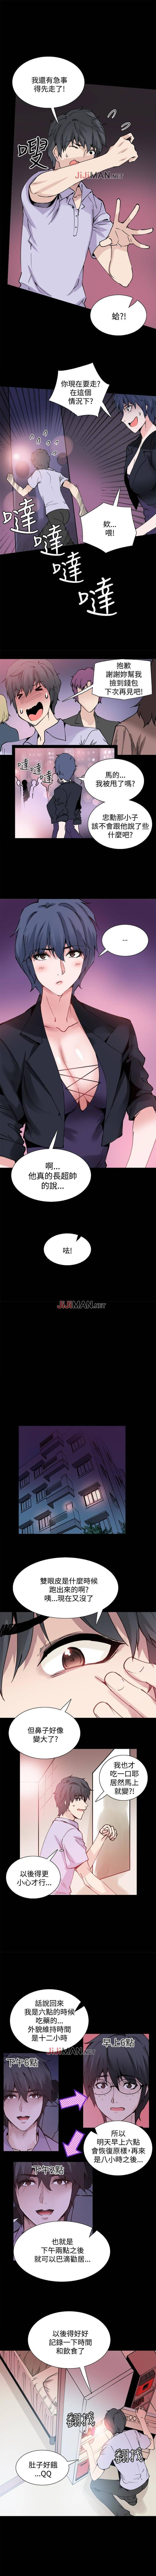 【已完结】Bodychange(作者:Seize & 死亡節奏) 第1~33话 42